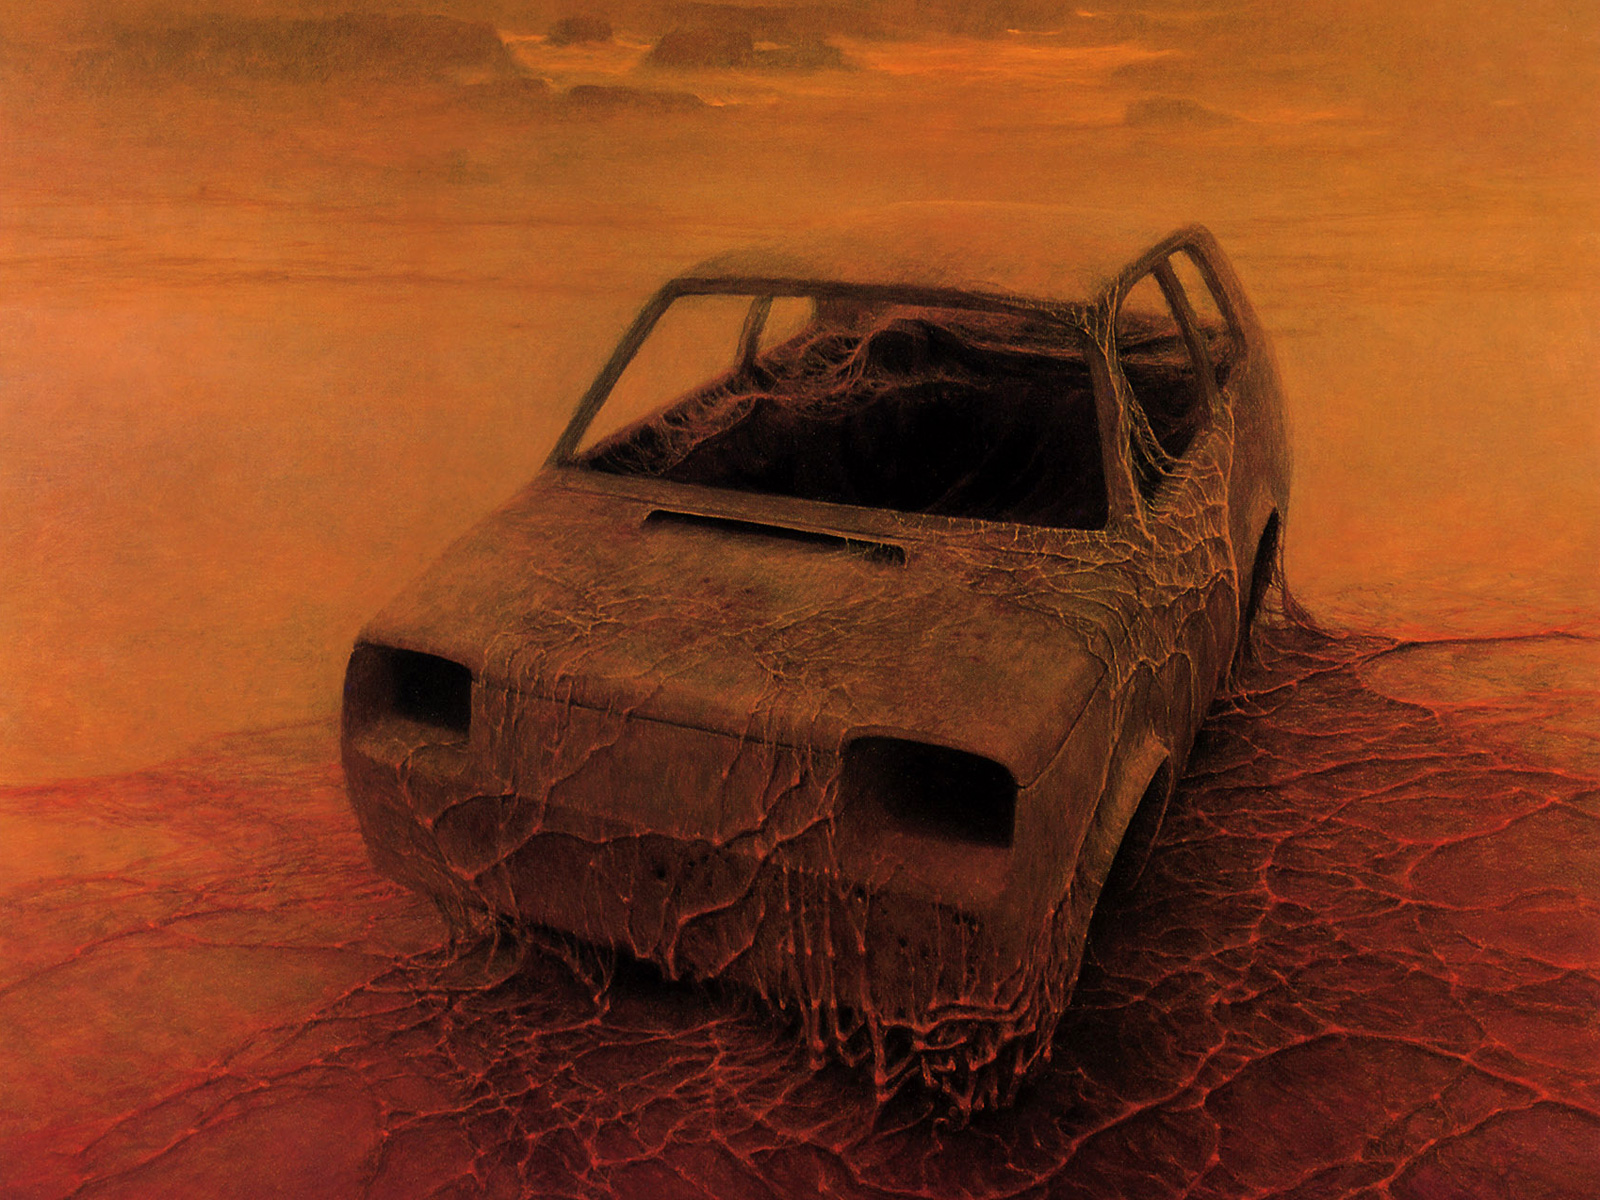 http://3.bp.blogspot.com/-cj-bCQrVbG8/UYPKXqCwdLI/AAAAAAAAFgM/EwoRoDYJ7ak/s1600/-Cars-Desert-Wrecks-Zdzislaw-Beksinski-Fresh-New-Hd-Wallpaper--.jpg